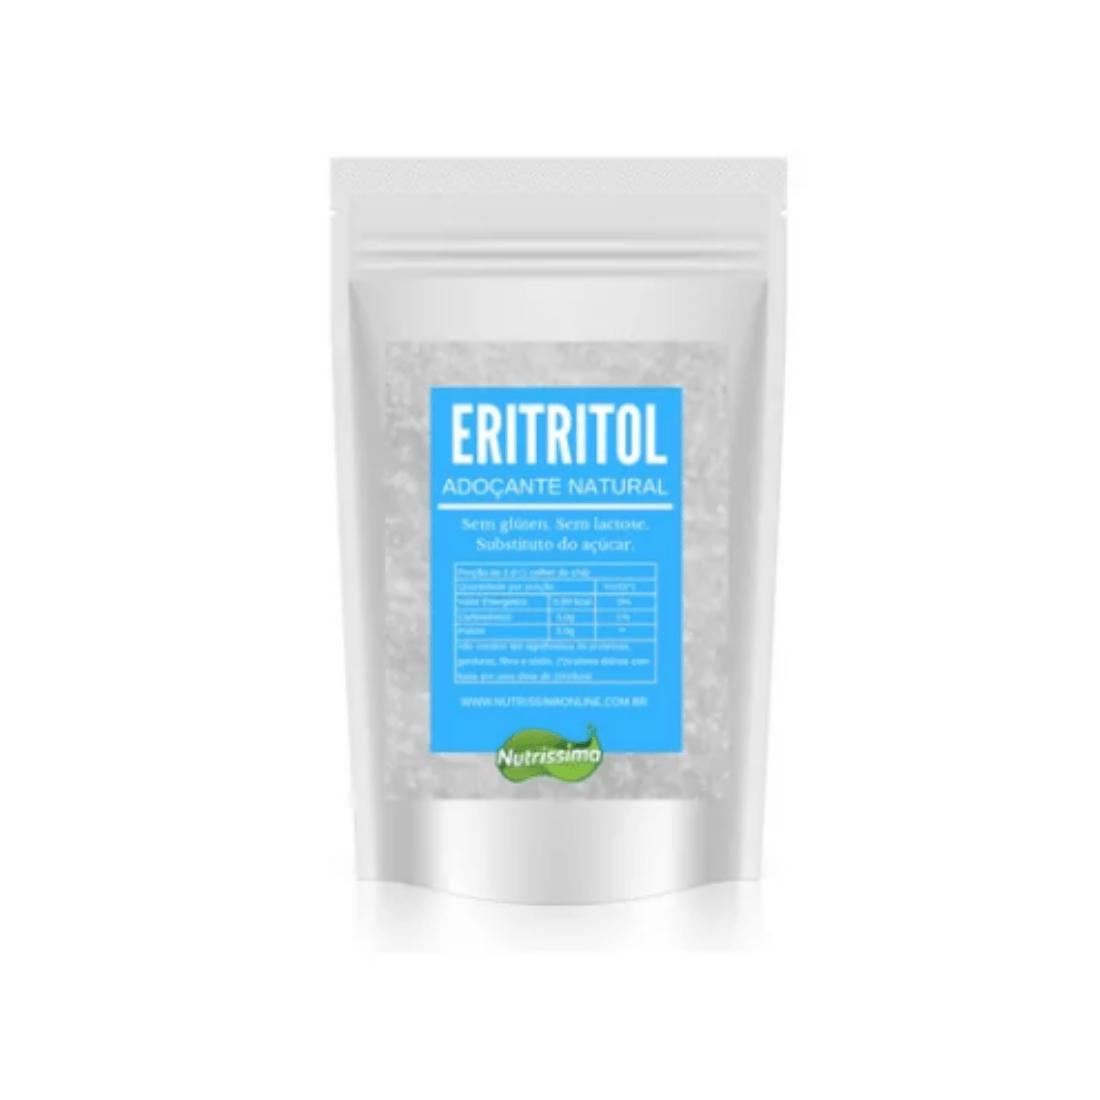 Eritritol Adoçante Natural Nutrissima 200g